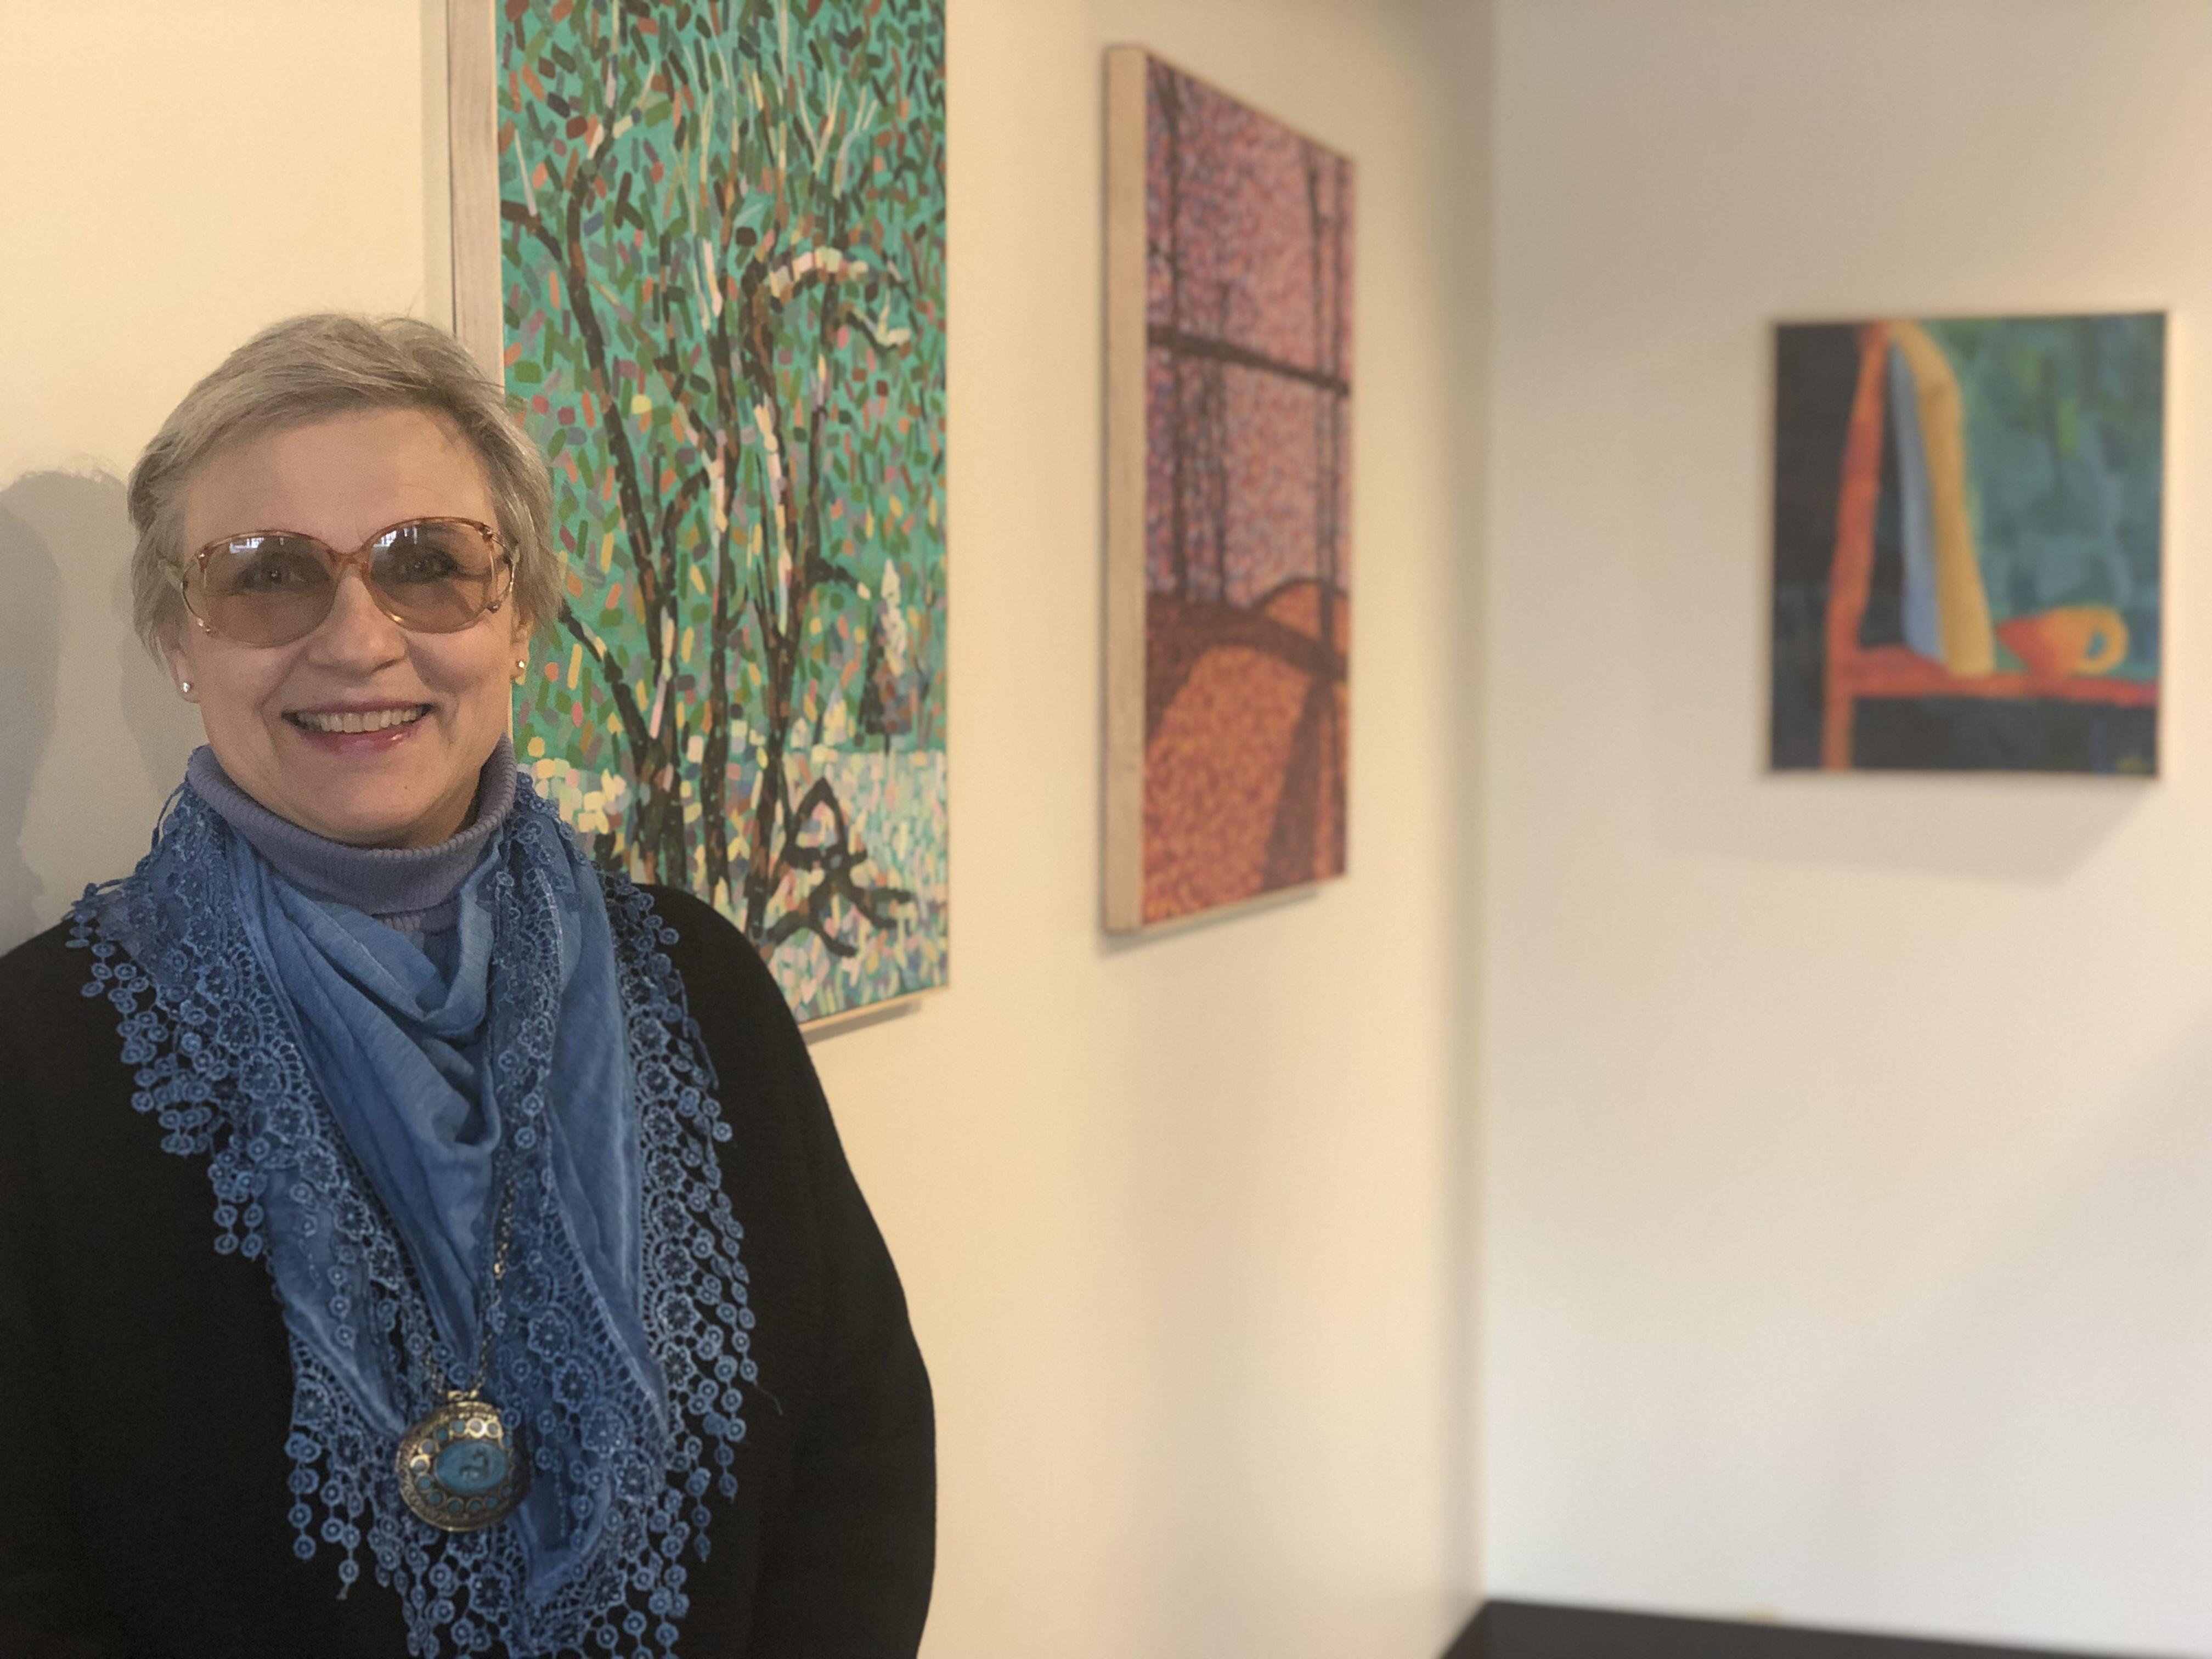 Natalia Himmirska with the student artwork.